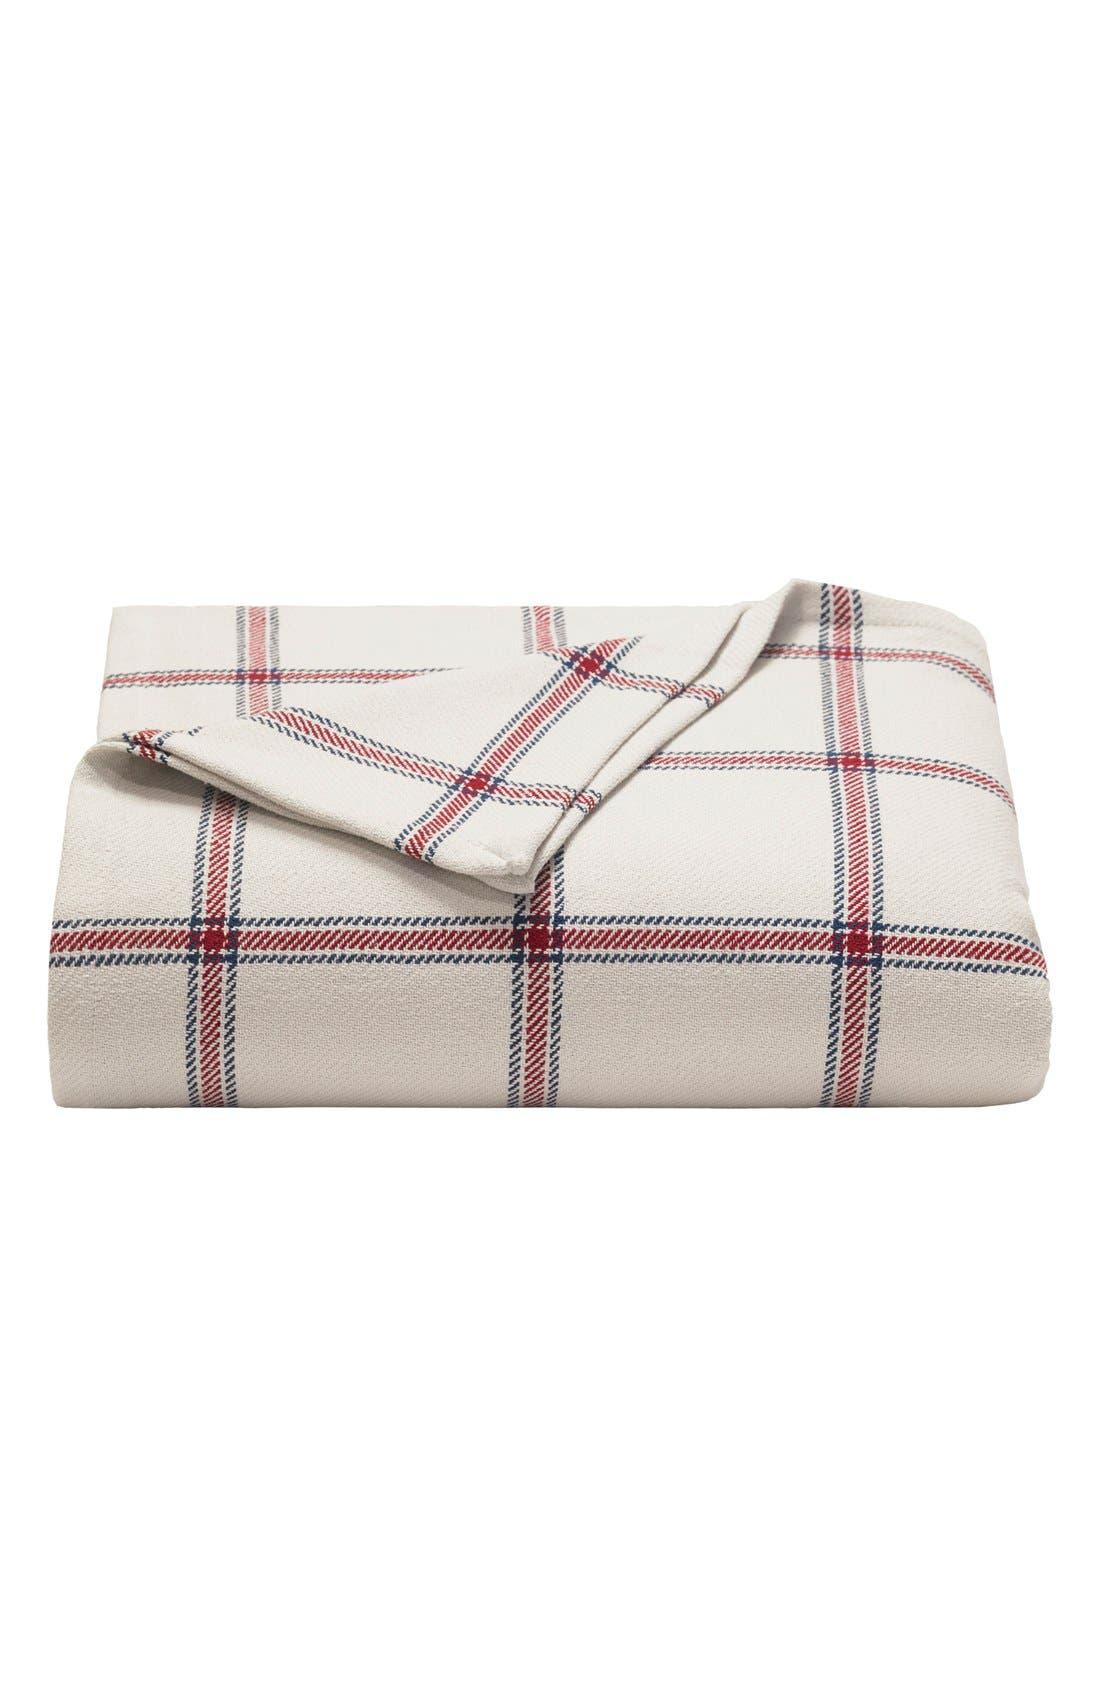 'Halstead' Windowpane Plaid Blanket,                         Main,                         color, Red